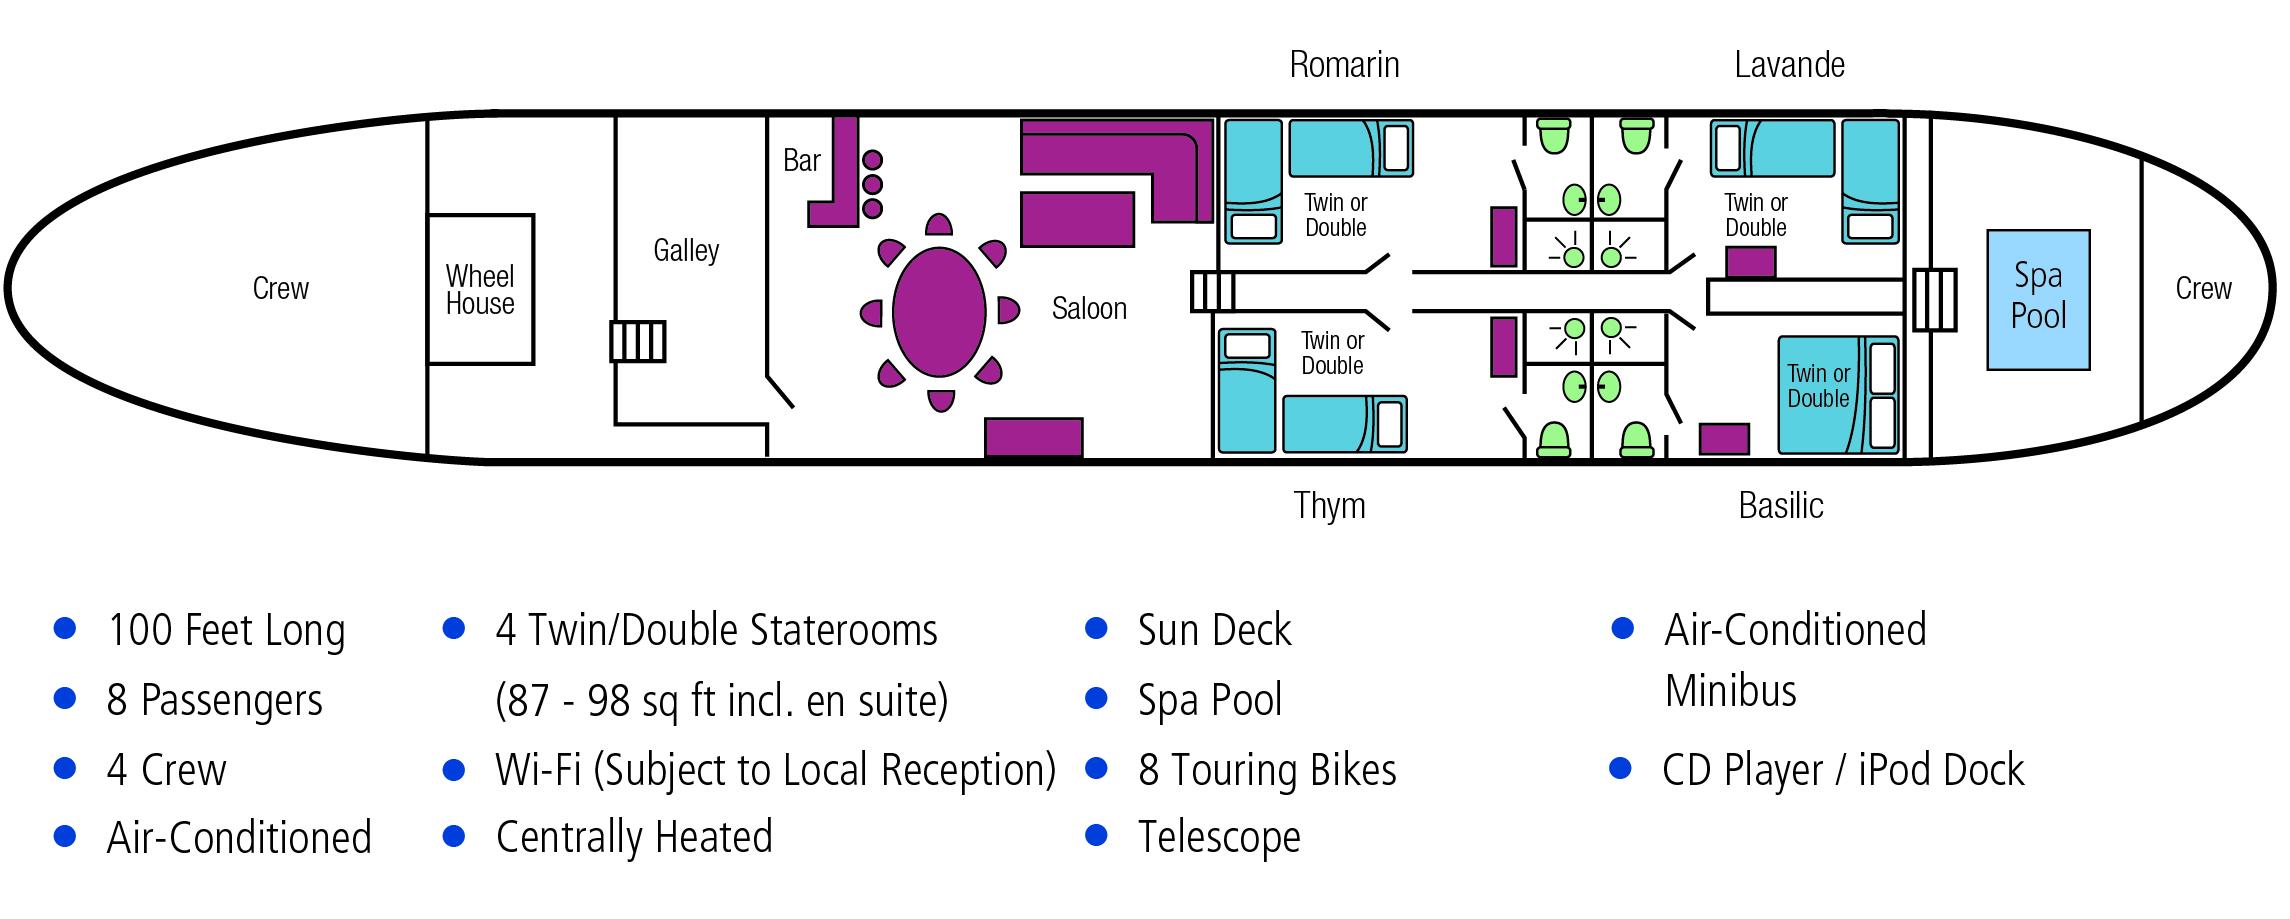 anjodi-deck-plan-highres_1.jpg#asset:188